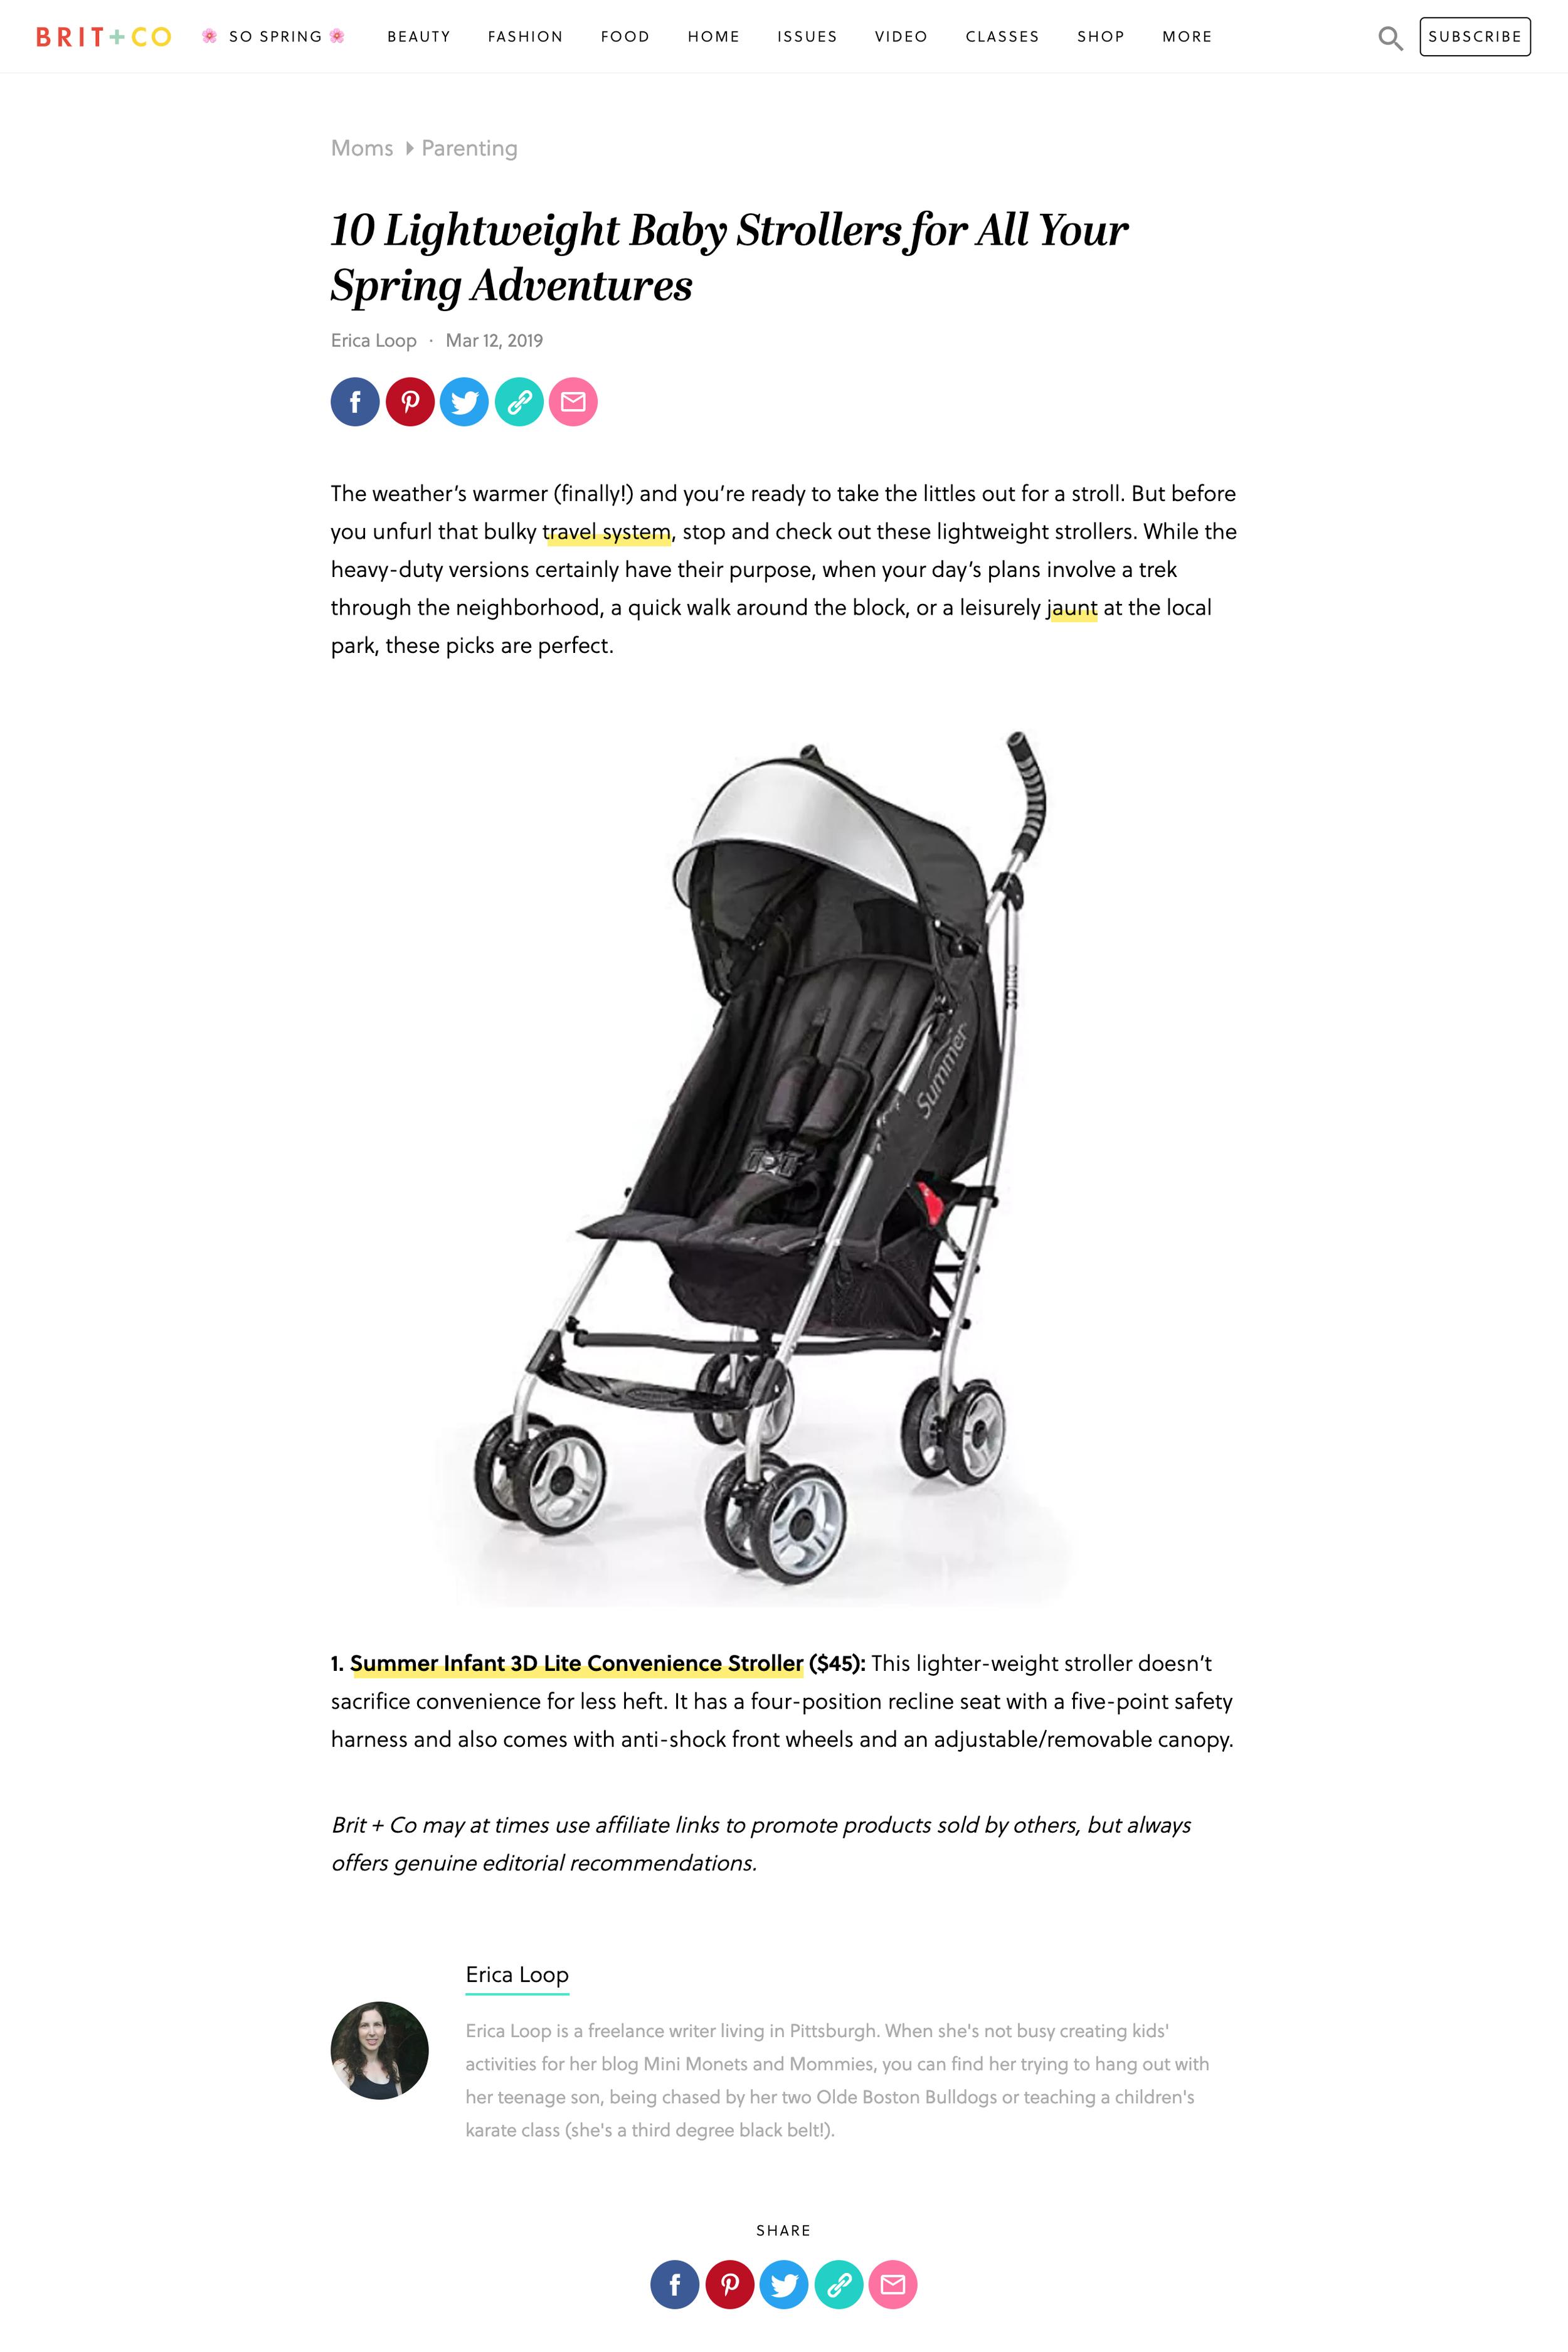 2019.03.12_Brit + Co_Summer 3Dlite stroller_cropped 2x3.png